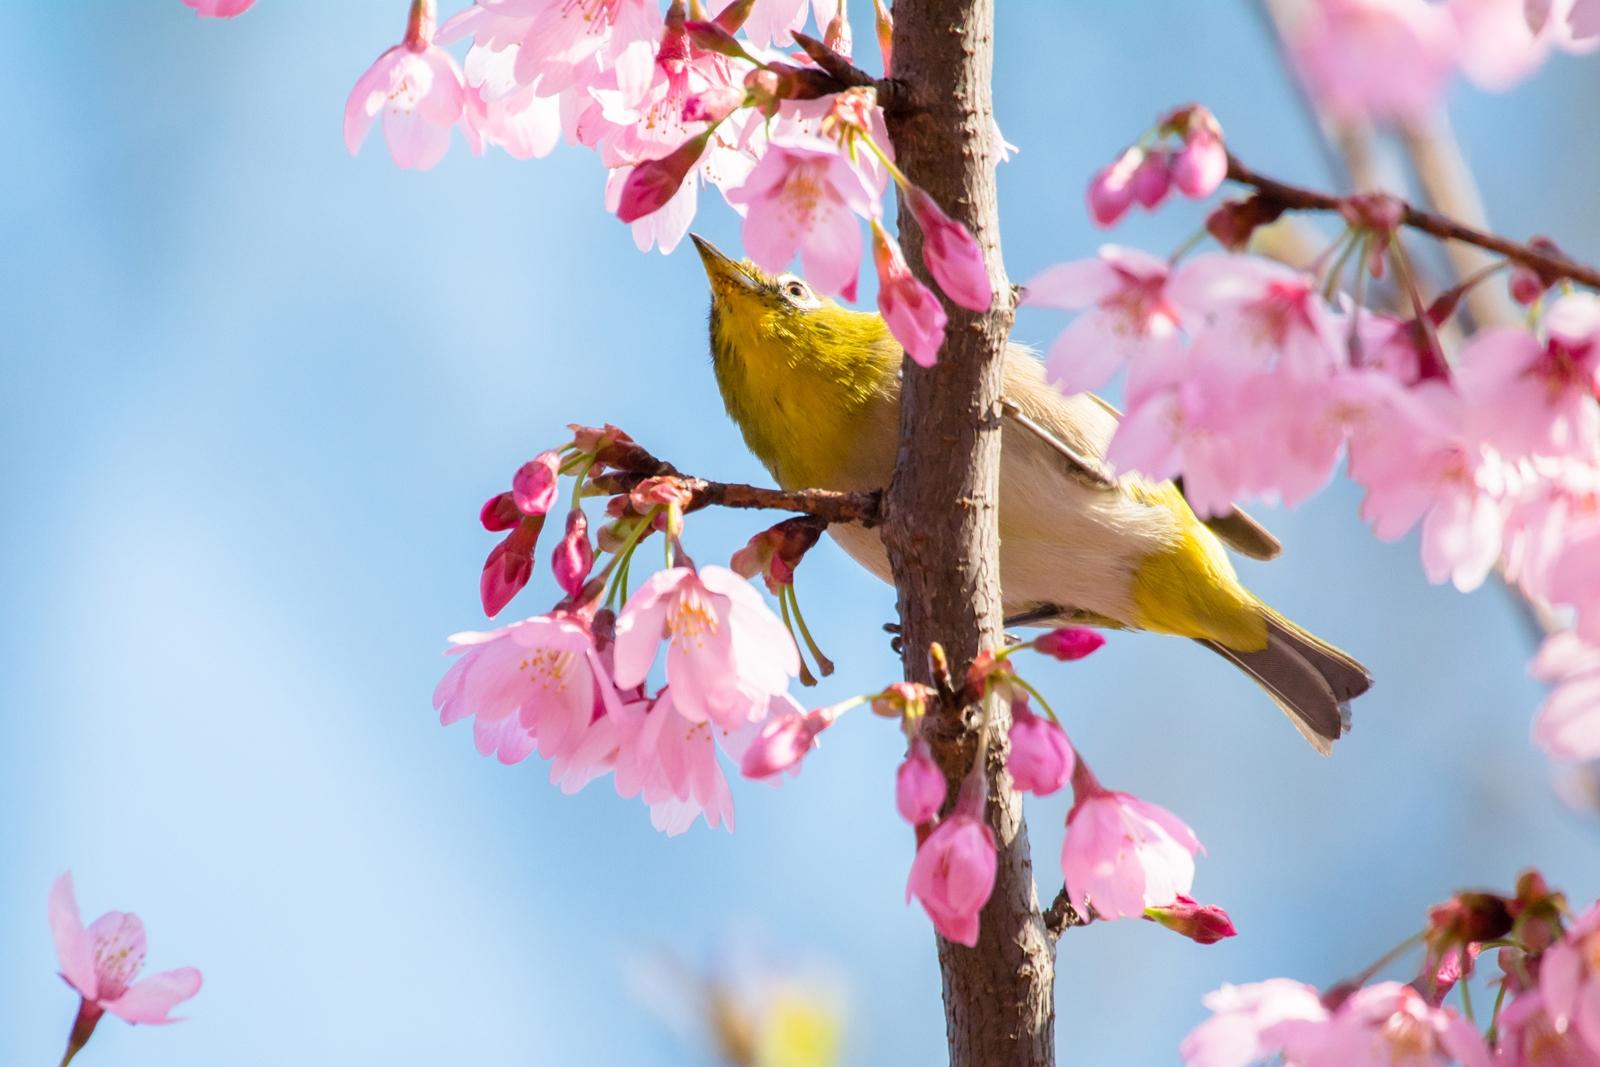 Photo: 花愛でて Loves the Cherry blossoms.  その花は魅了する まわりが見えなくなるほどに 夢中で夢中で 気持ちはもう止まらない  Cherry blossoms and Japanese White-eye. (水元公園の早咲きの桜とメジロ)  #fujisakura #cooljapan #365cooljapanmay  #birdphotography #birds  #kawaii  Nikon D7100 SIGMA APO 50-500mm F5-6.3 DG OS HSM [ Day324, April 1st ] (2枚追加:Added 2 photo)  小鳥の詩朗読 https://youtu.be/rDwM5C91p-g?list=PL2YtHGm0-R3qVsaqvQe9OYdJFCkI98wzF